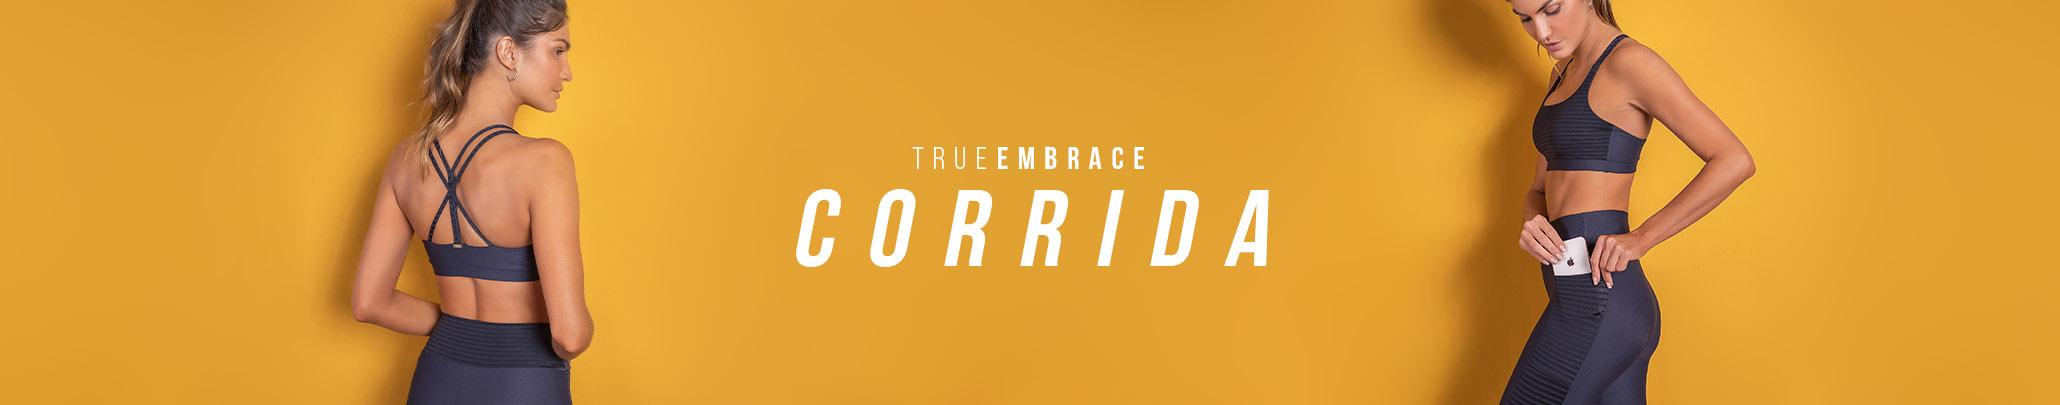 True Embrace Corrida